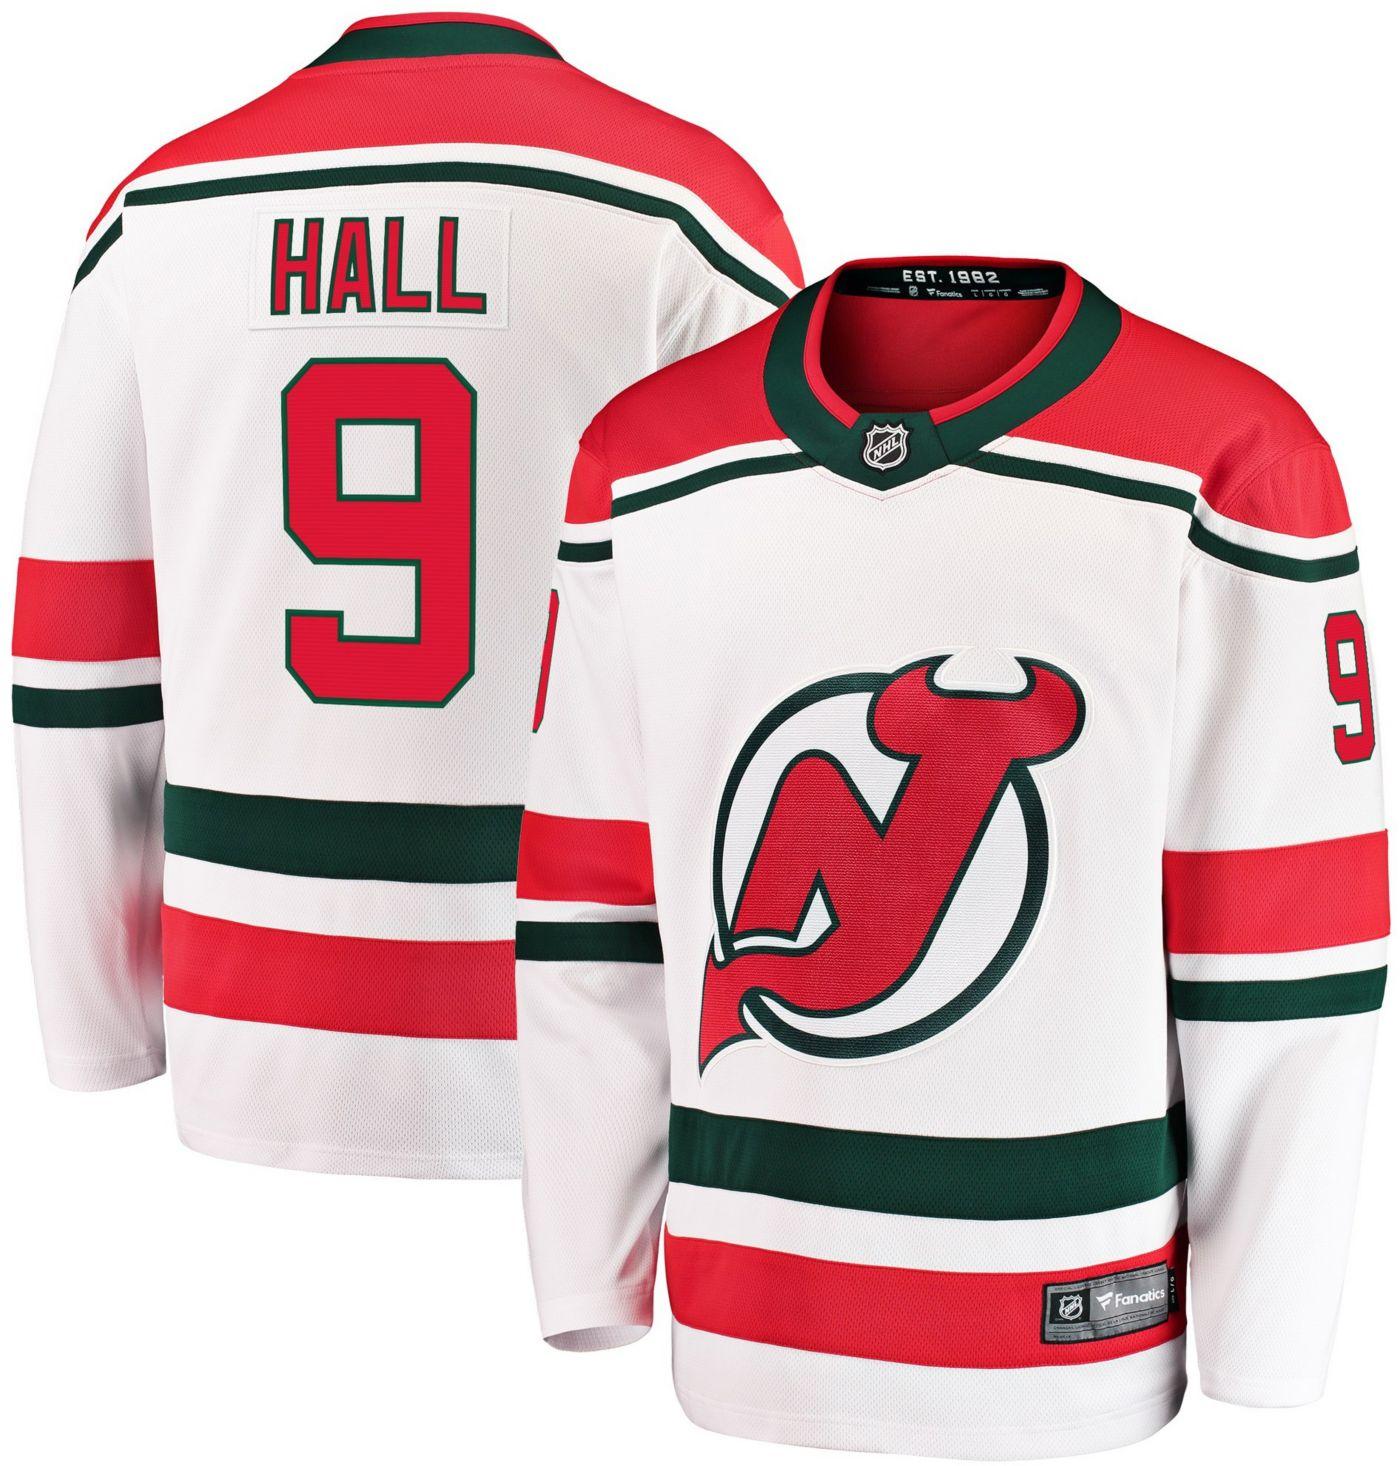 NHL Men's New Jersey Devils Taylor Hall #9 Breakaway Retro Replica Jersey